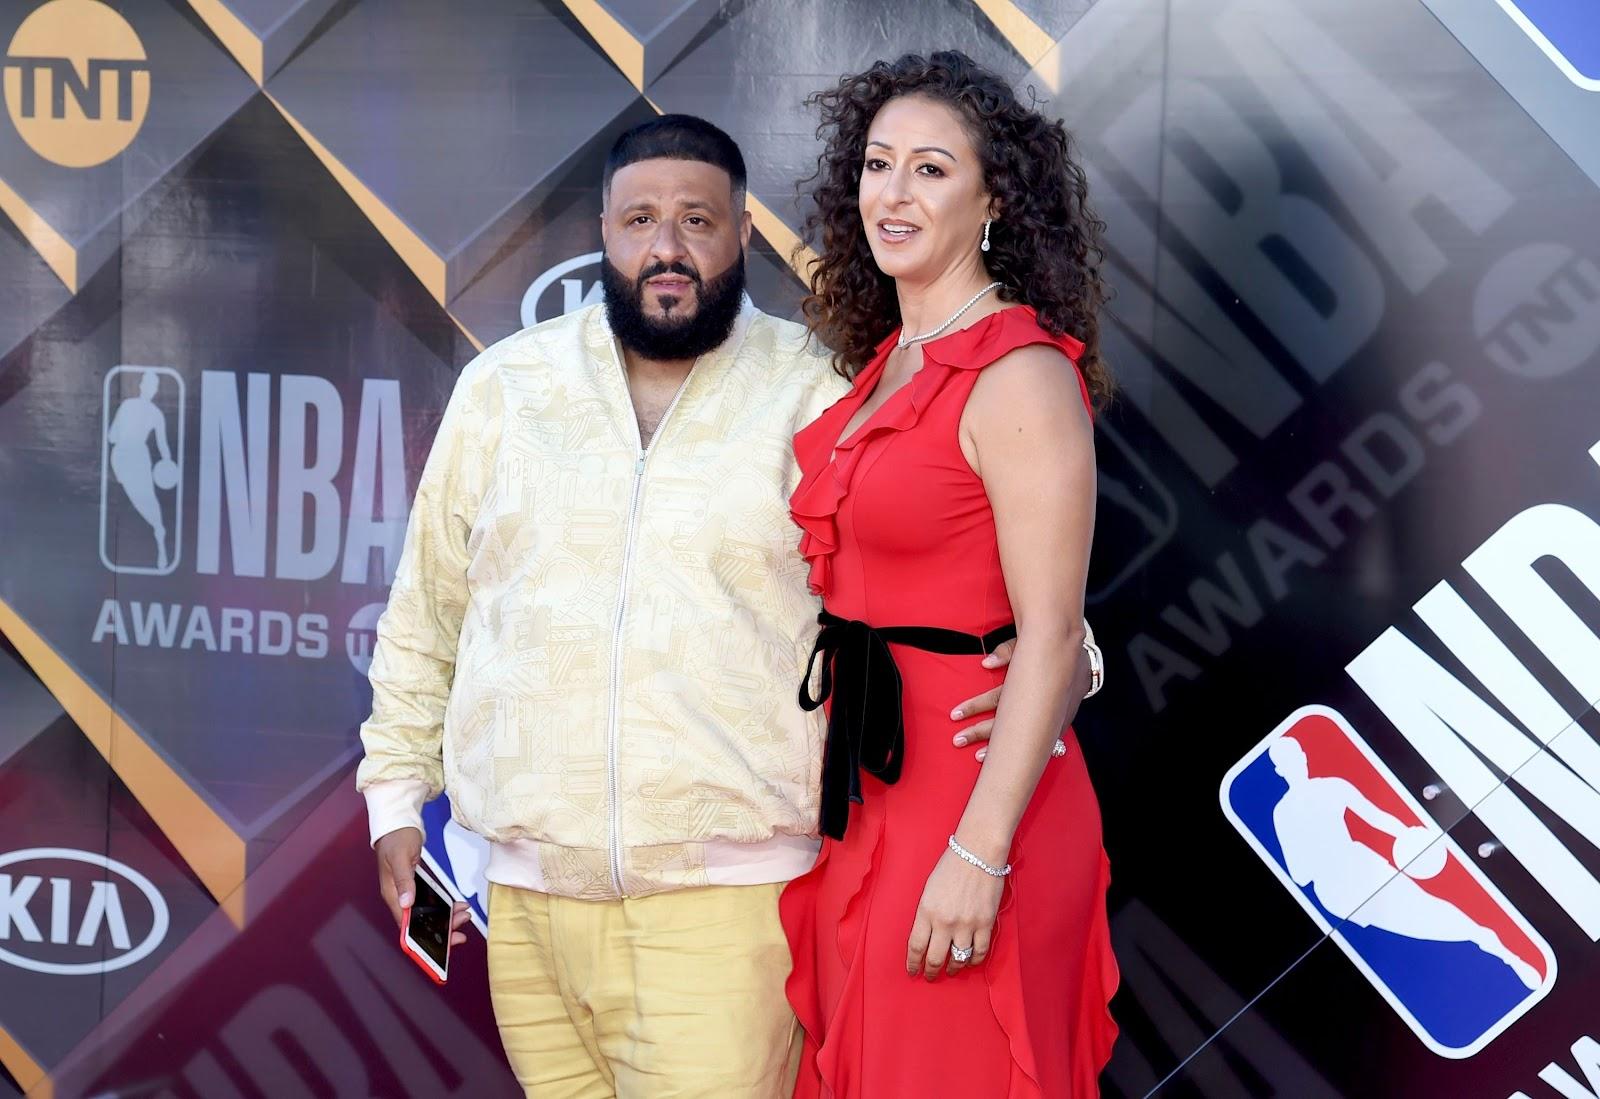 Is DJ Khaled Married?